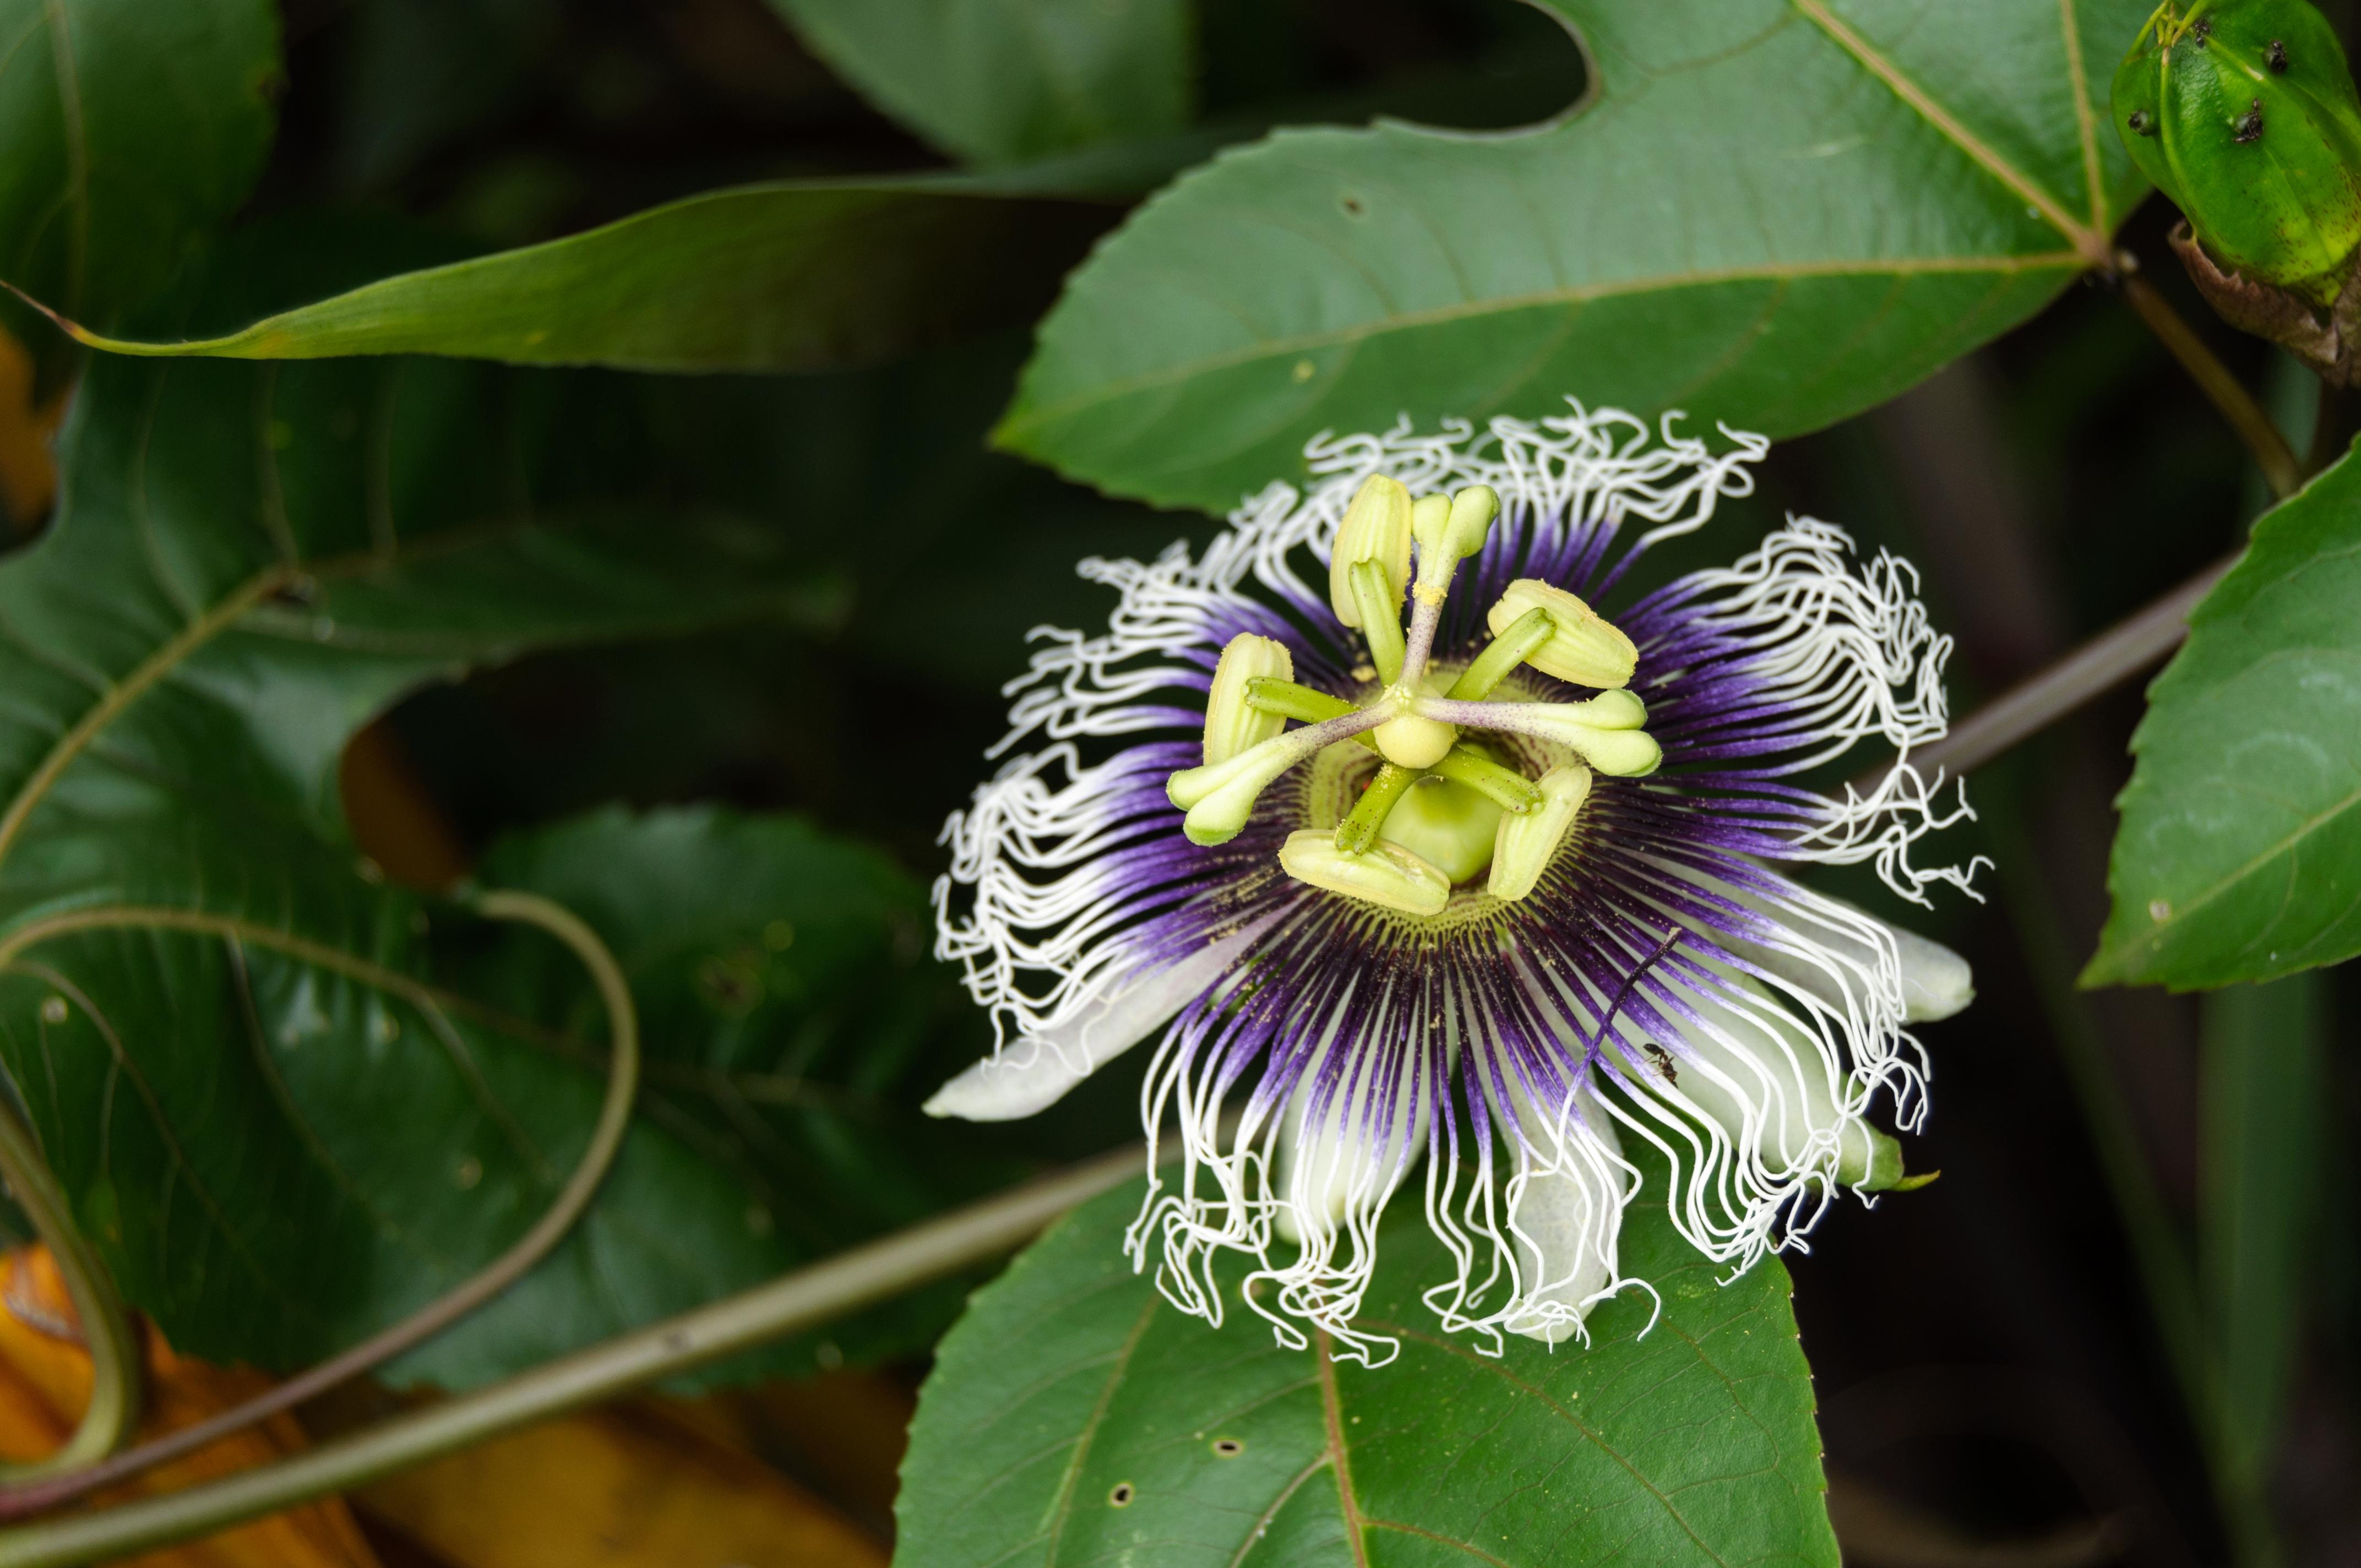 File Flor Maracujá Flower of Passion Fruit Flor de la fruta de la pasión